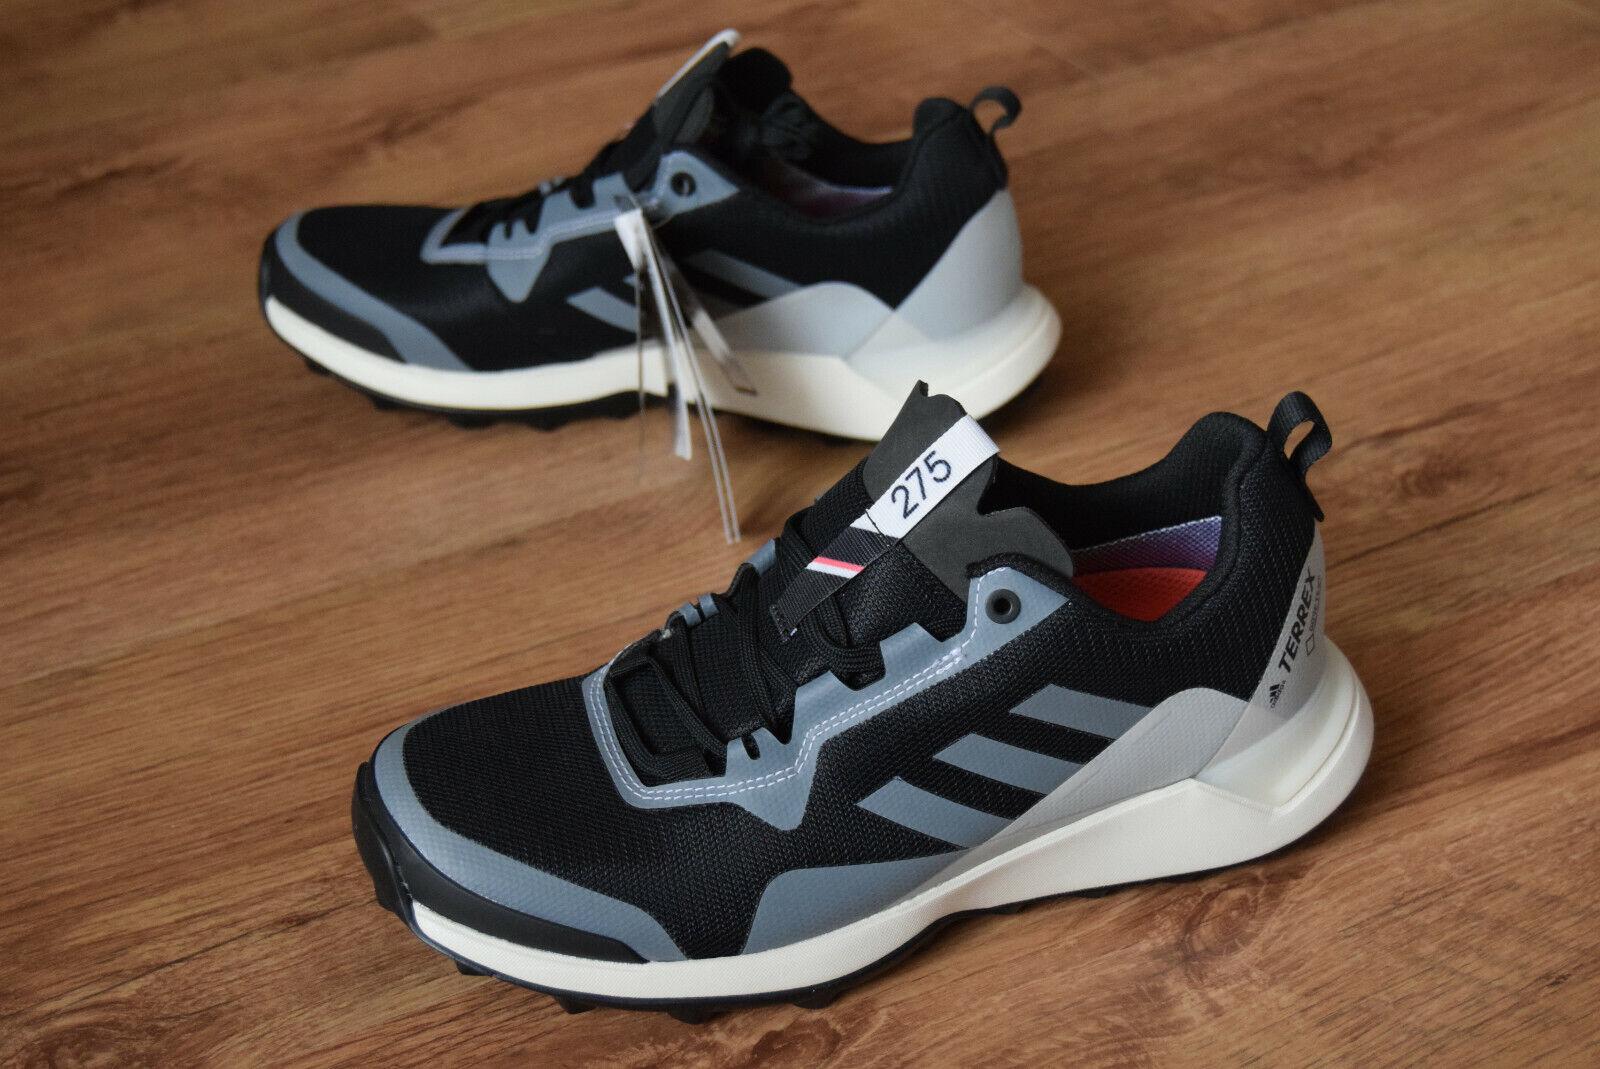 Adidas Terrex cmtk GTX W 37 38 38,5 40,5 Gore-Tex Walking schuhe AQ3983 ax2 Swift